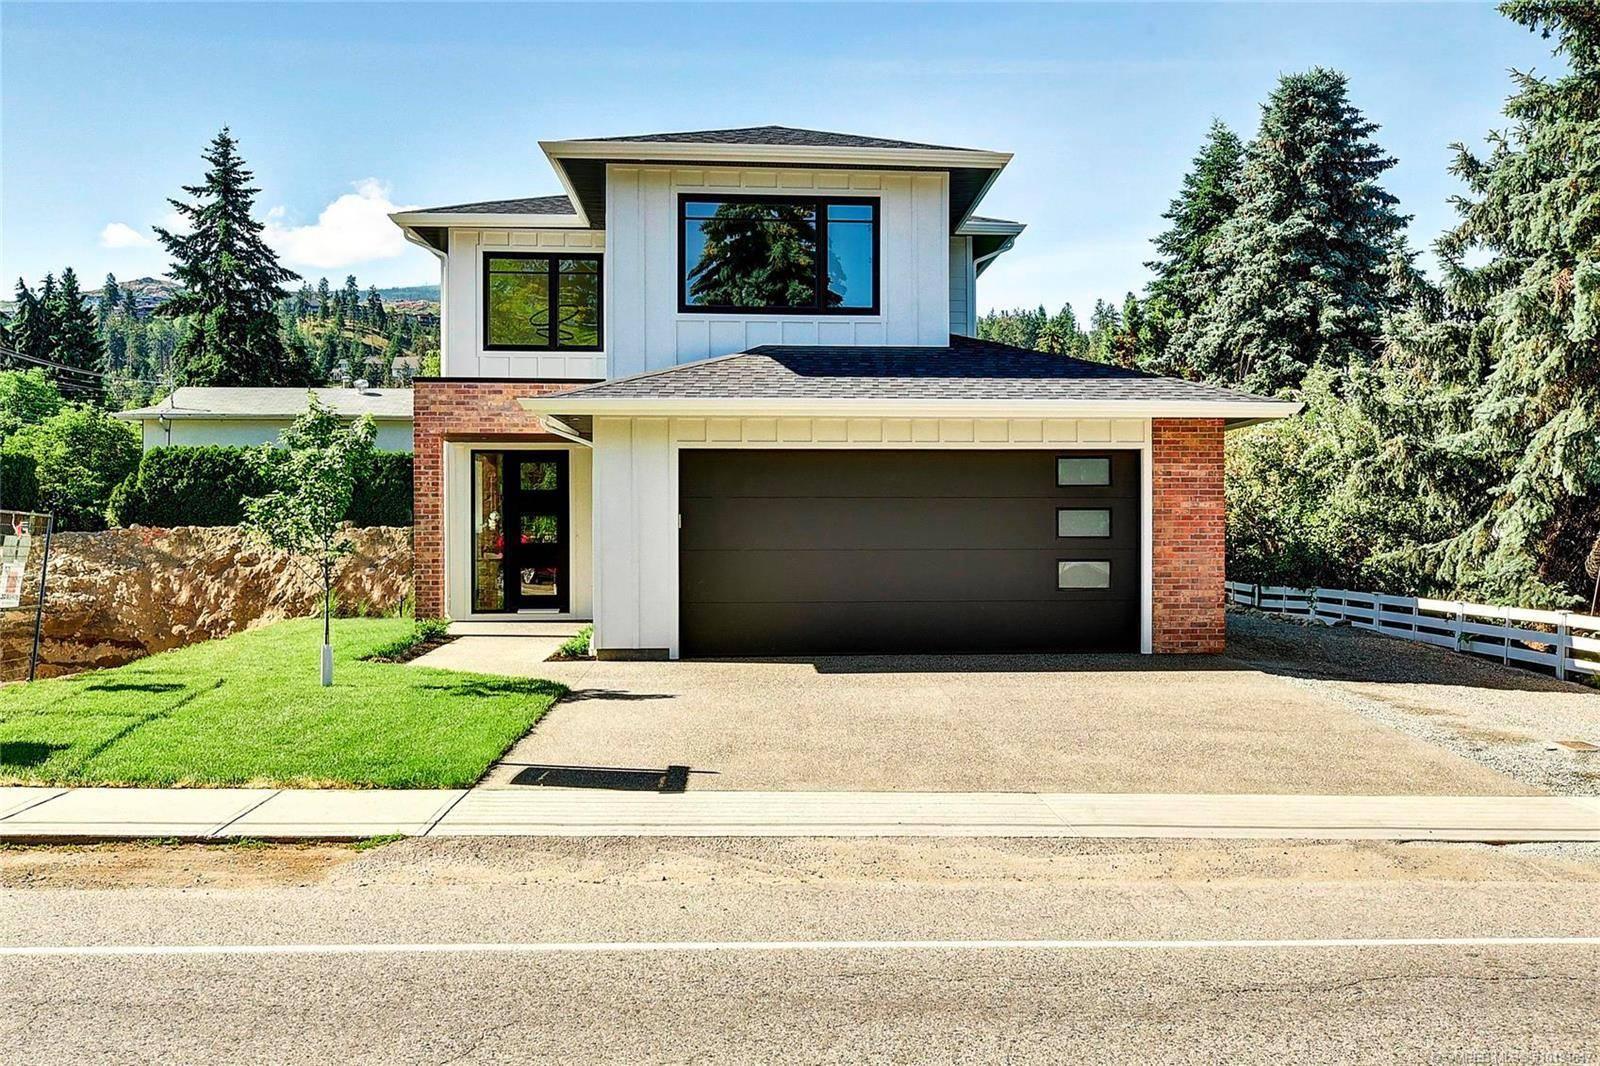 House for sale at 695 Mcclure Rd Kelowna British Columbia - MLS: 10194647